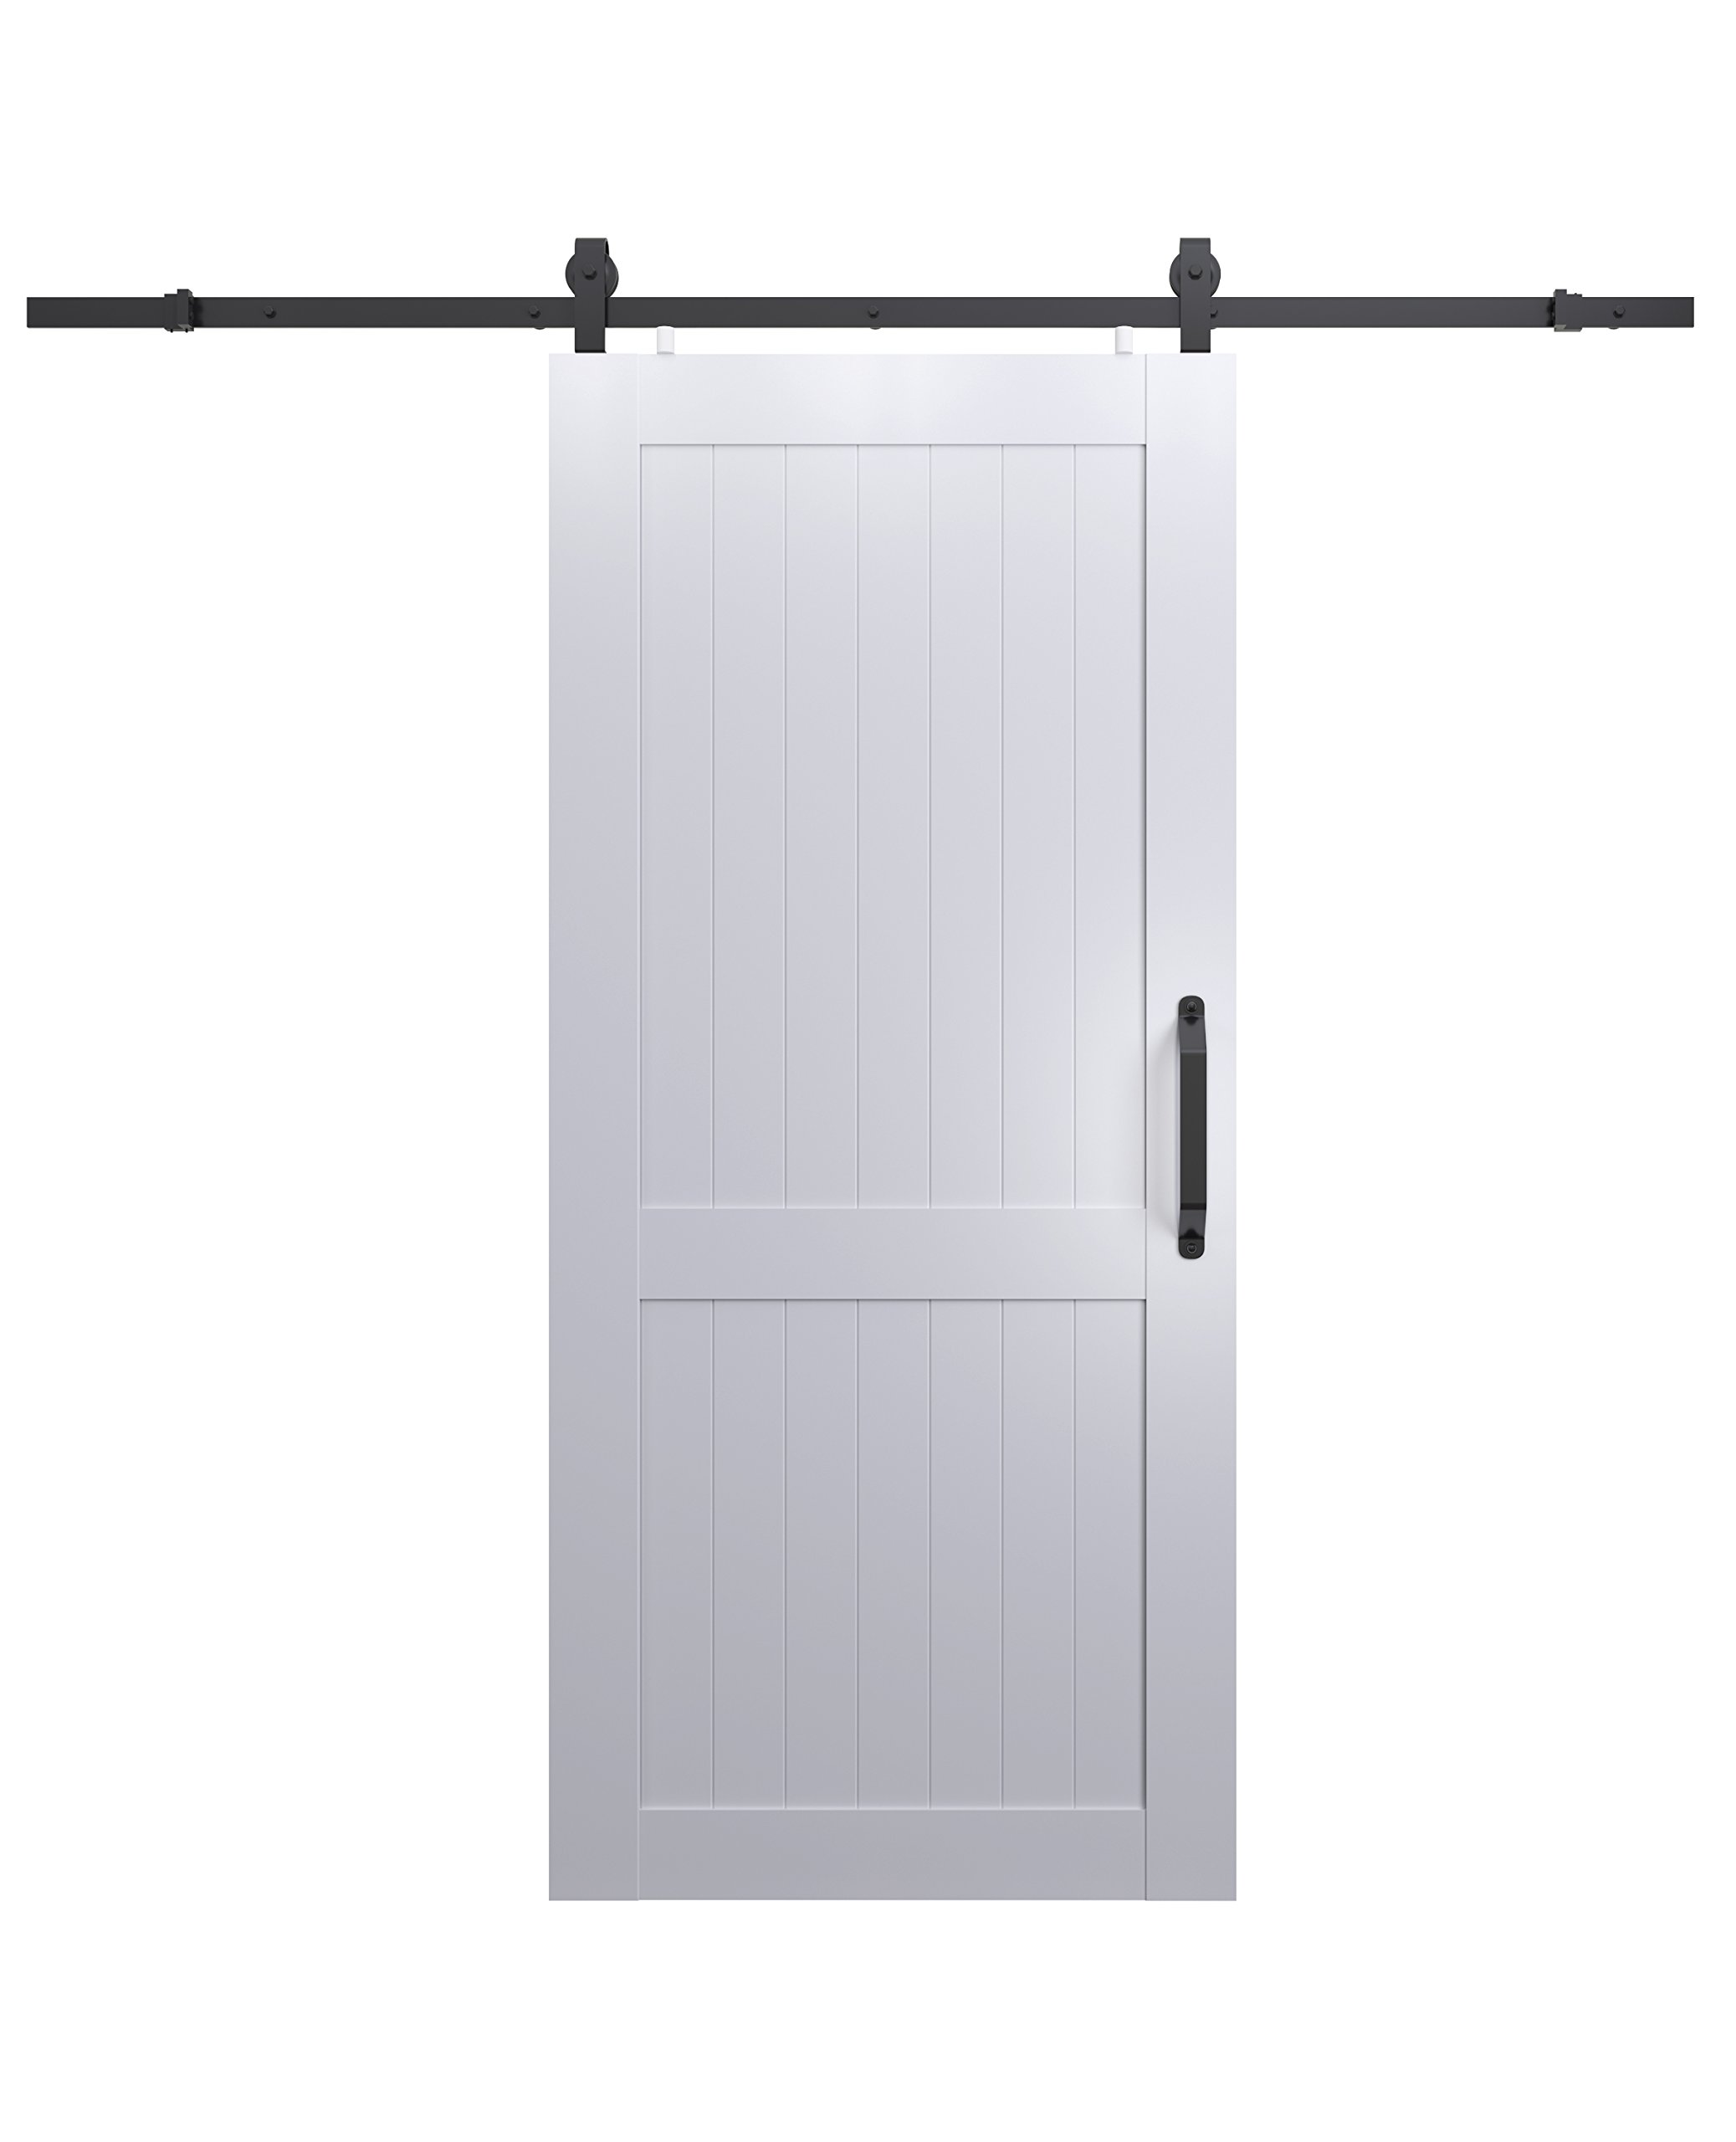 LTL Home Products MLB3684HKD Millbrooke Pvc Barn Door Kit, 36'' x 84'', White